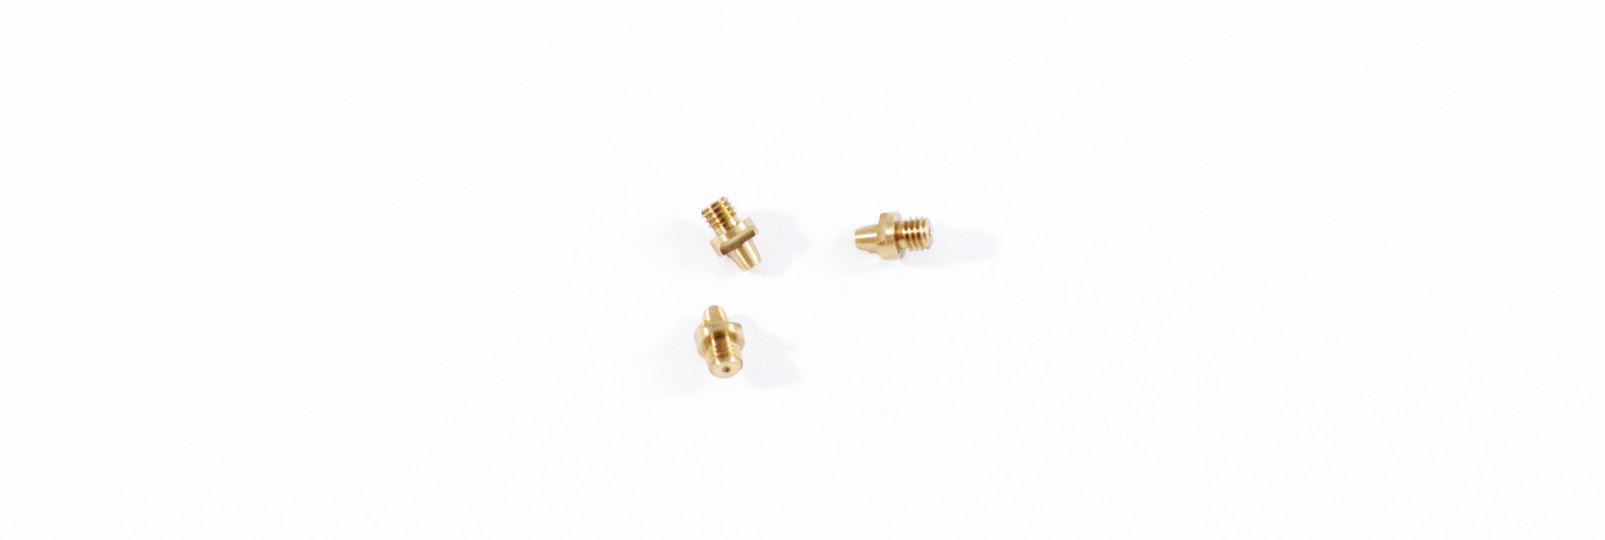 Set 3 beryllium nipples Remington